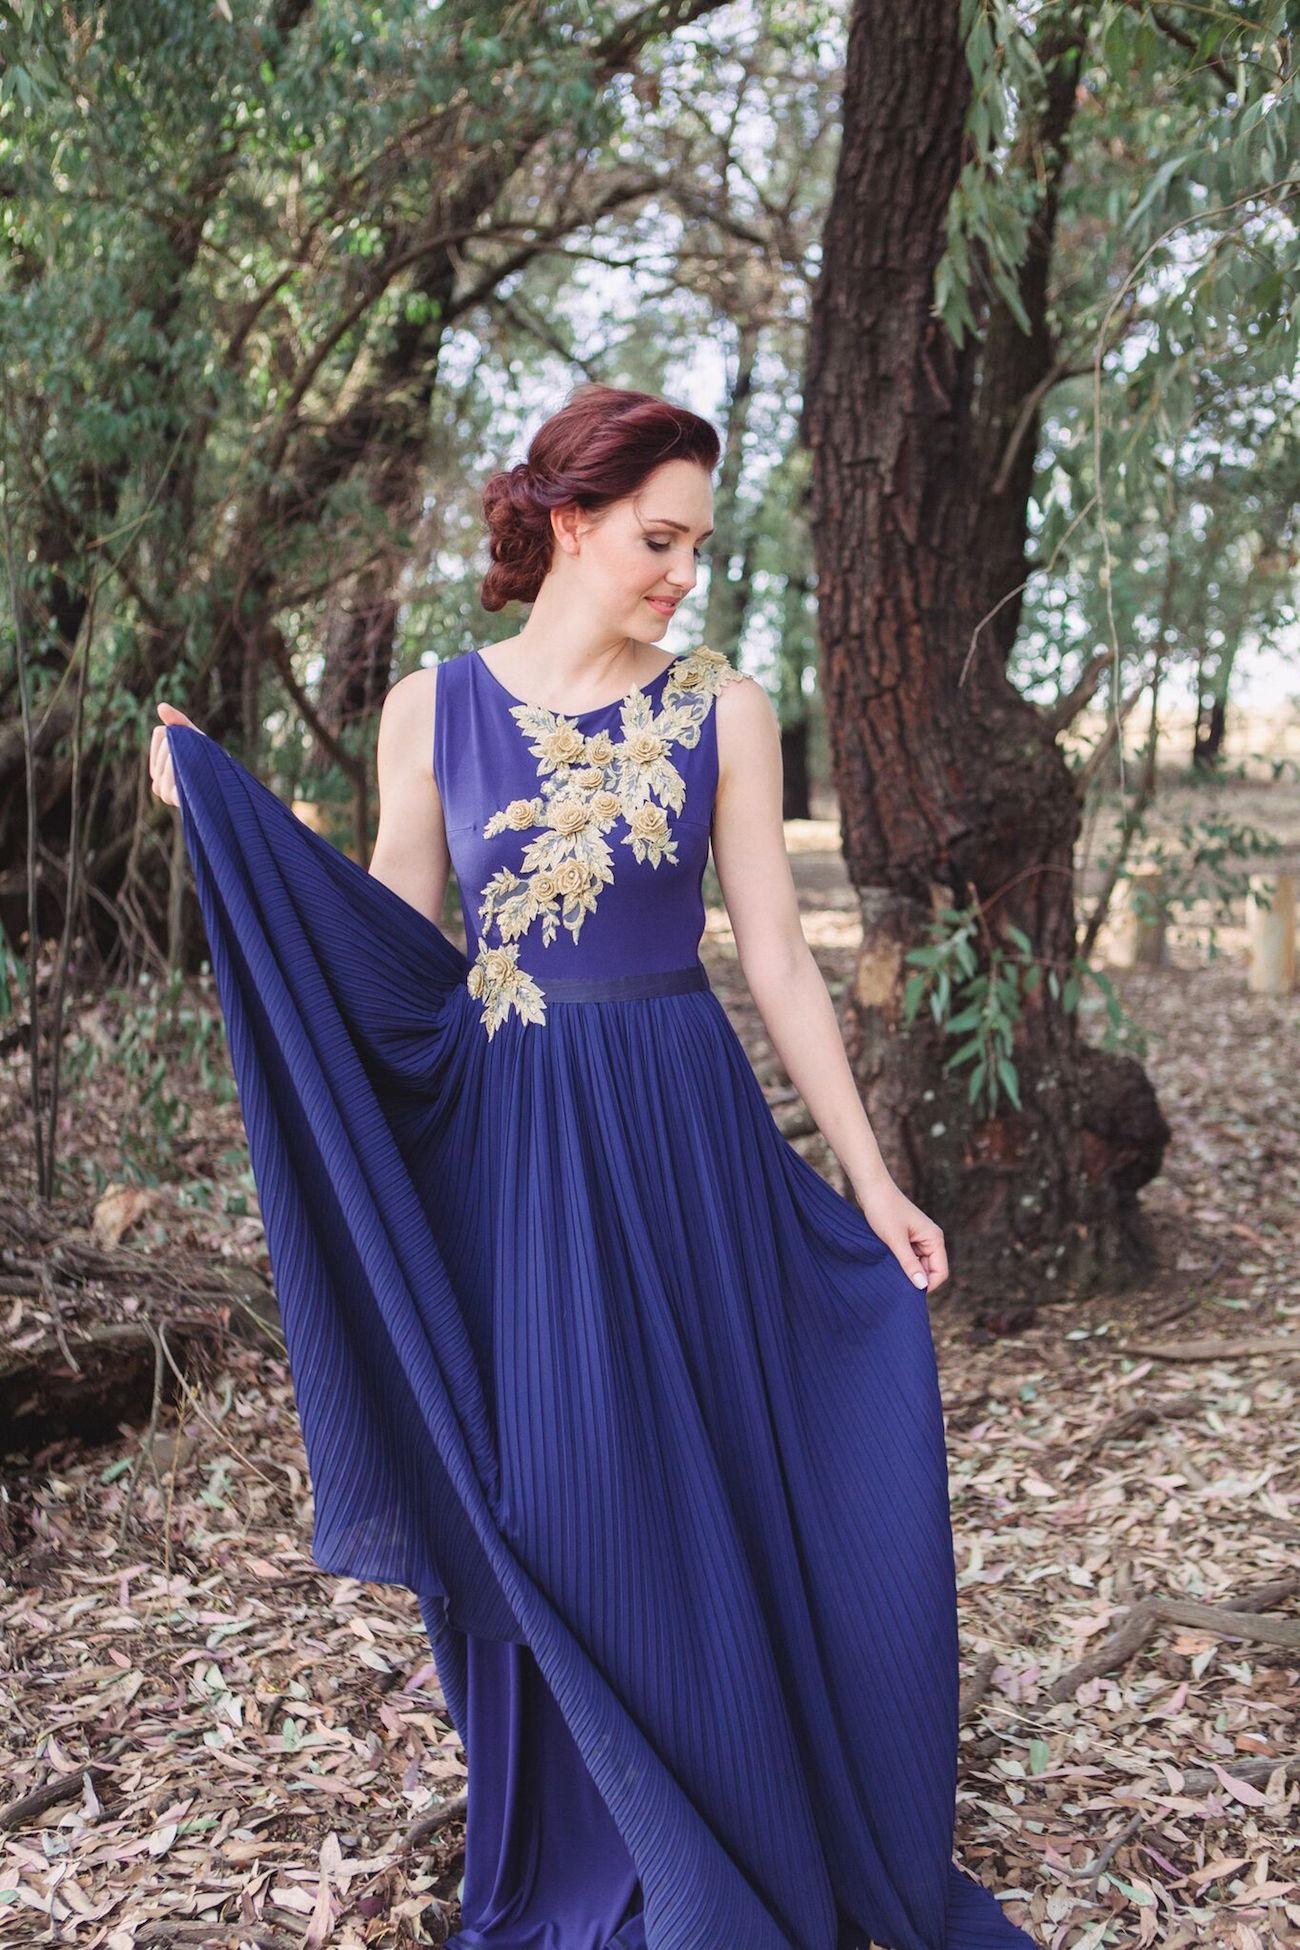 Indigo Blue Wedding Dress   Credit: Dust & Dreams Photography